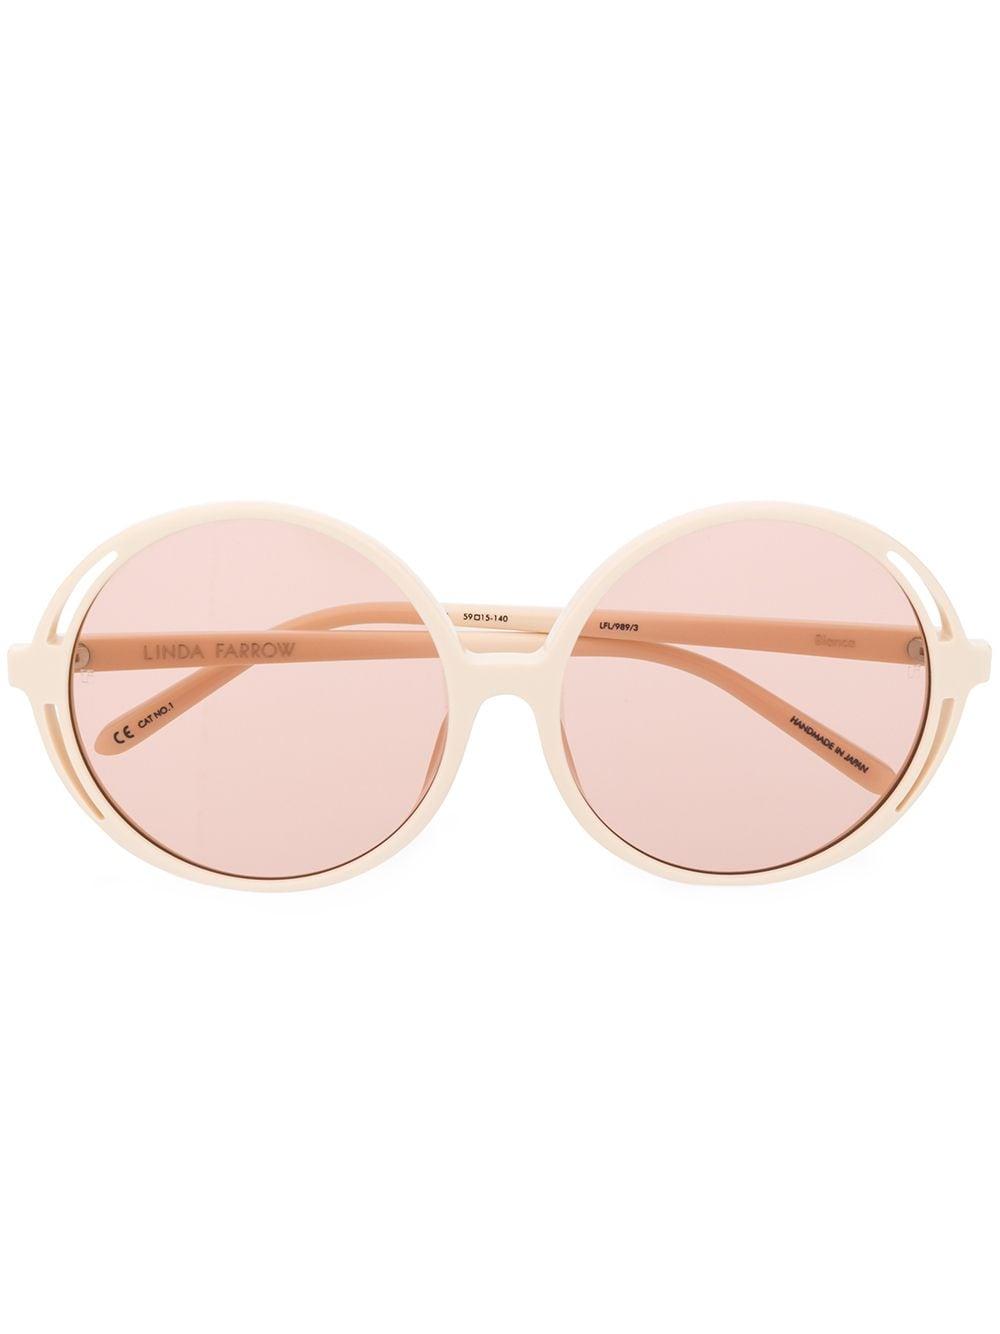 Linda Farrow 'Bianca' Sonnenbrille - Nude